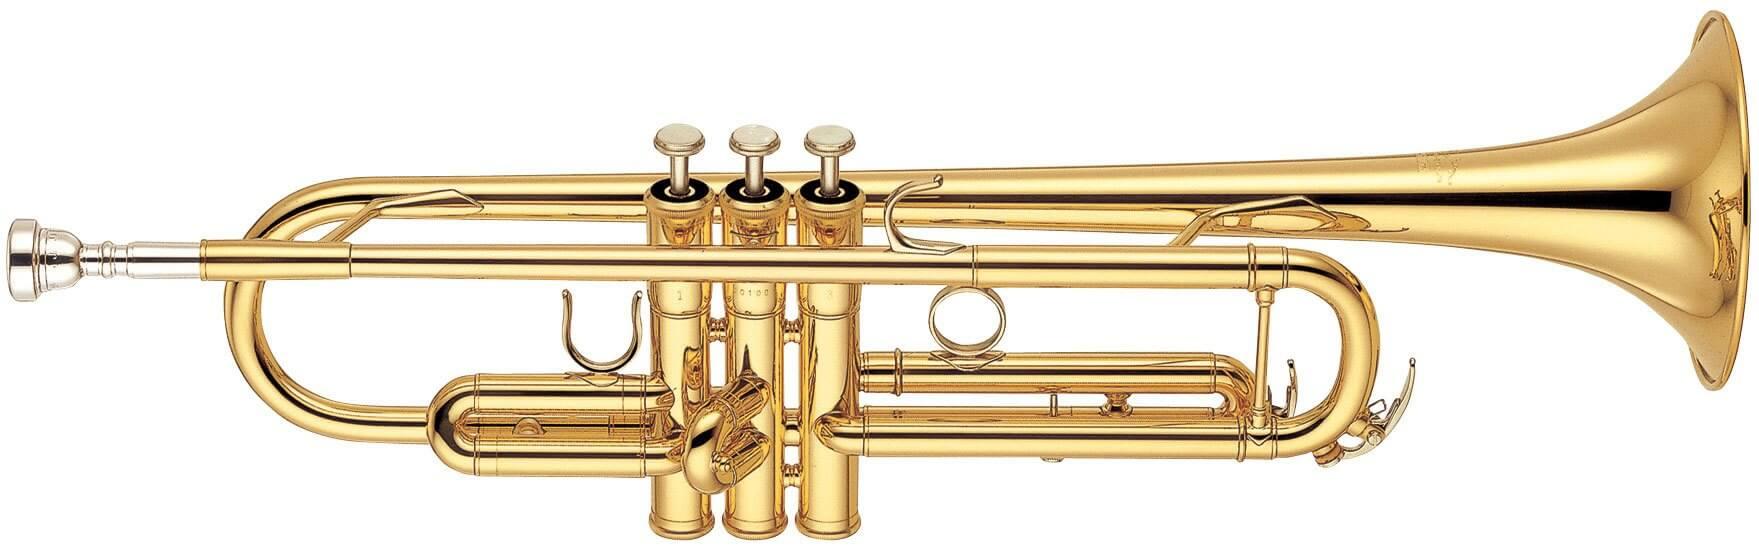 Trompeta Yamaha Ytr 6345G Lacada